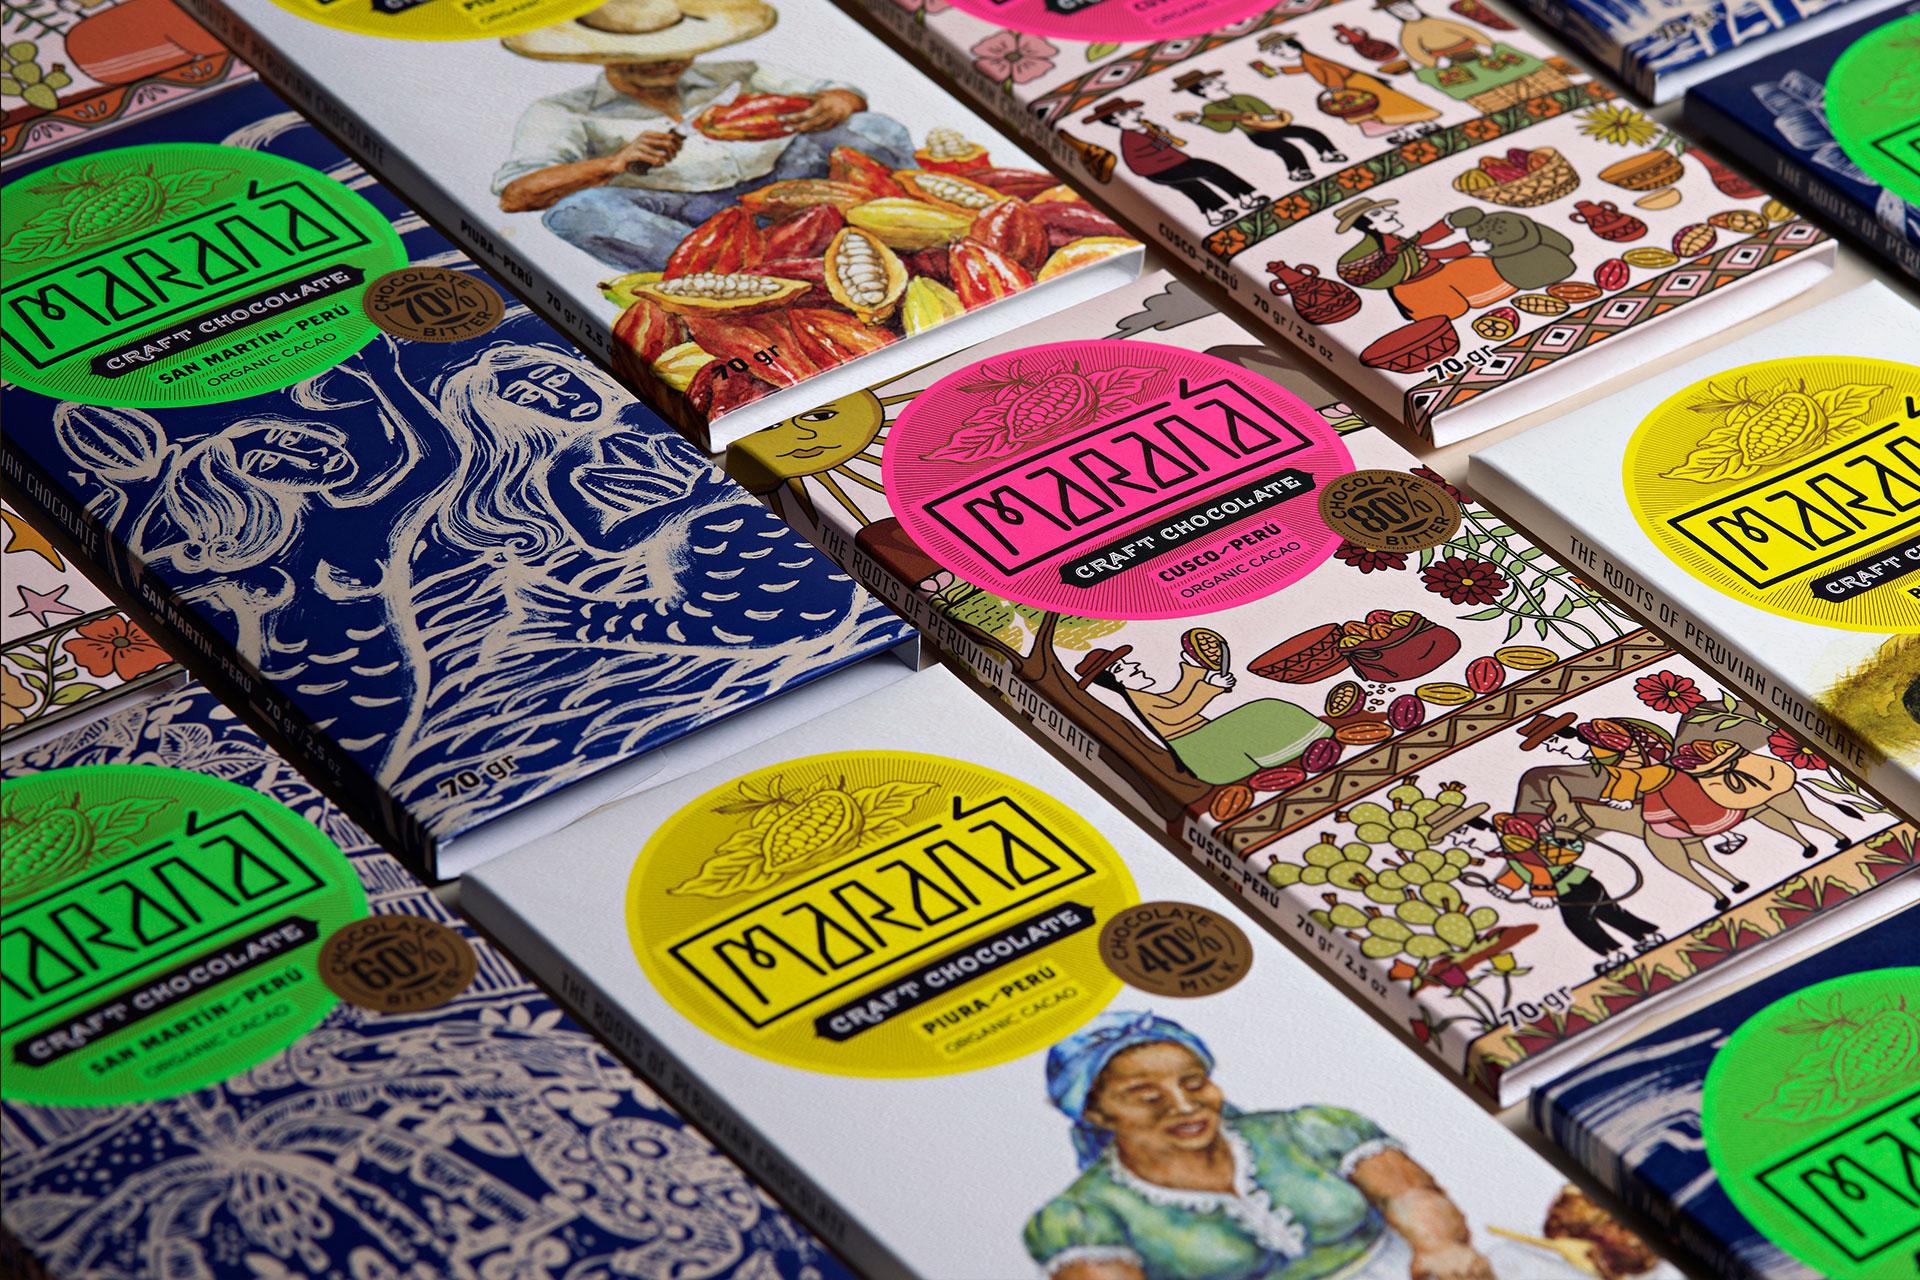 Chocolate artesanal peruano ingresa con éxito a Taiwán